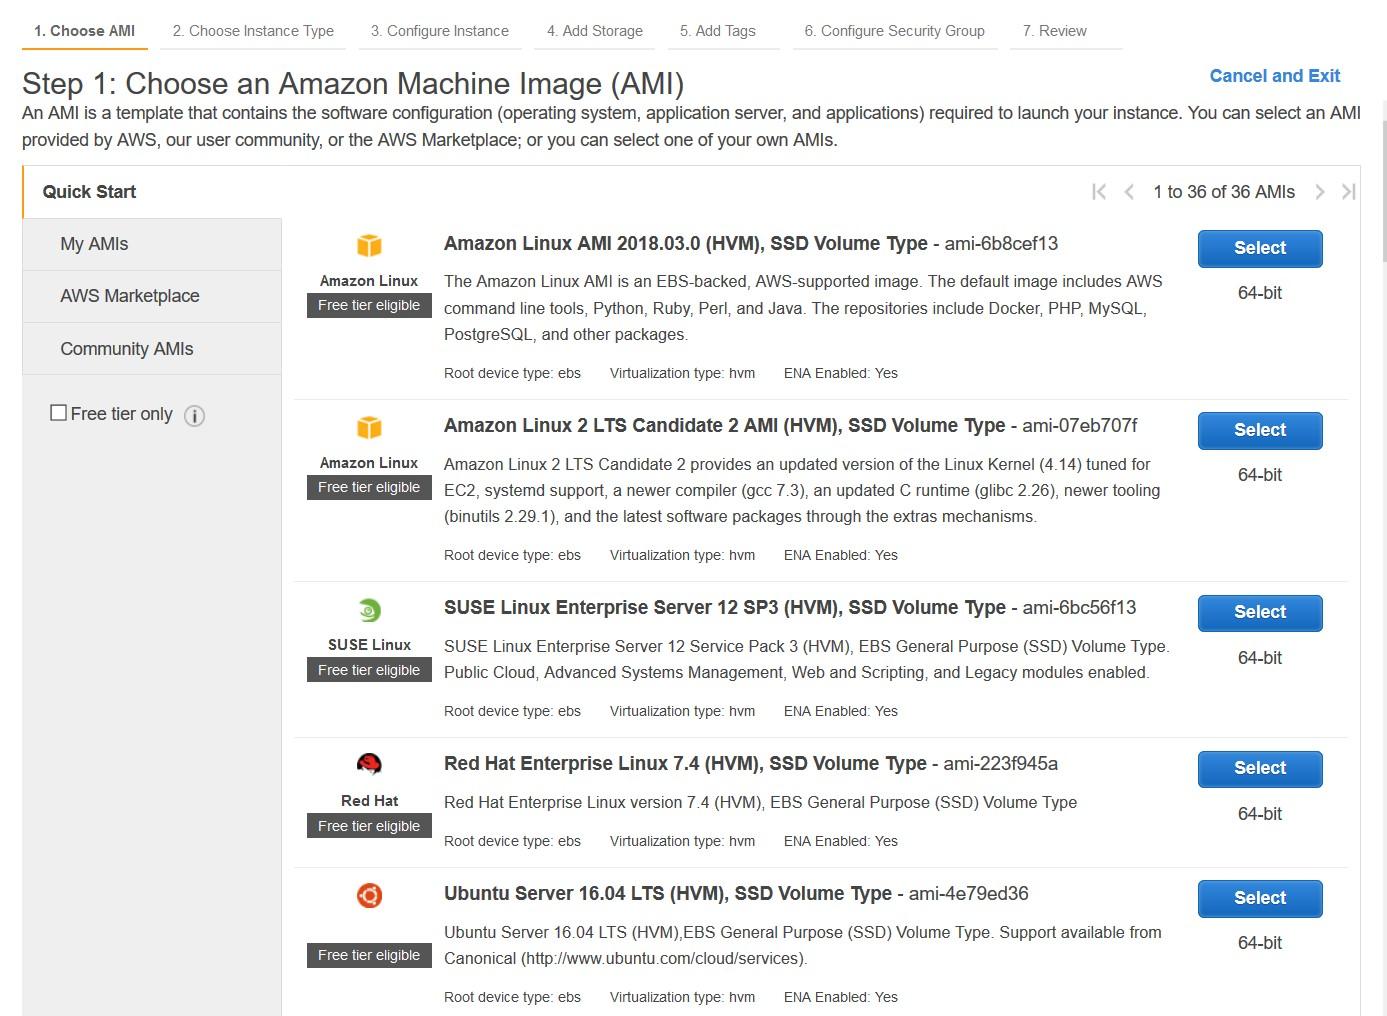 Amazon Machine Image (AMI) 選択のスクリーンショット